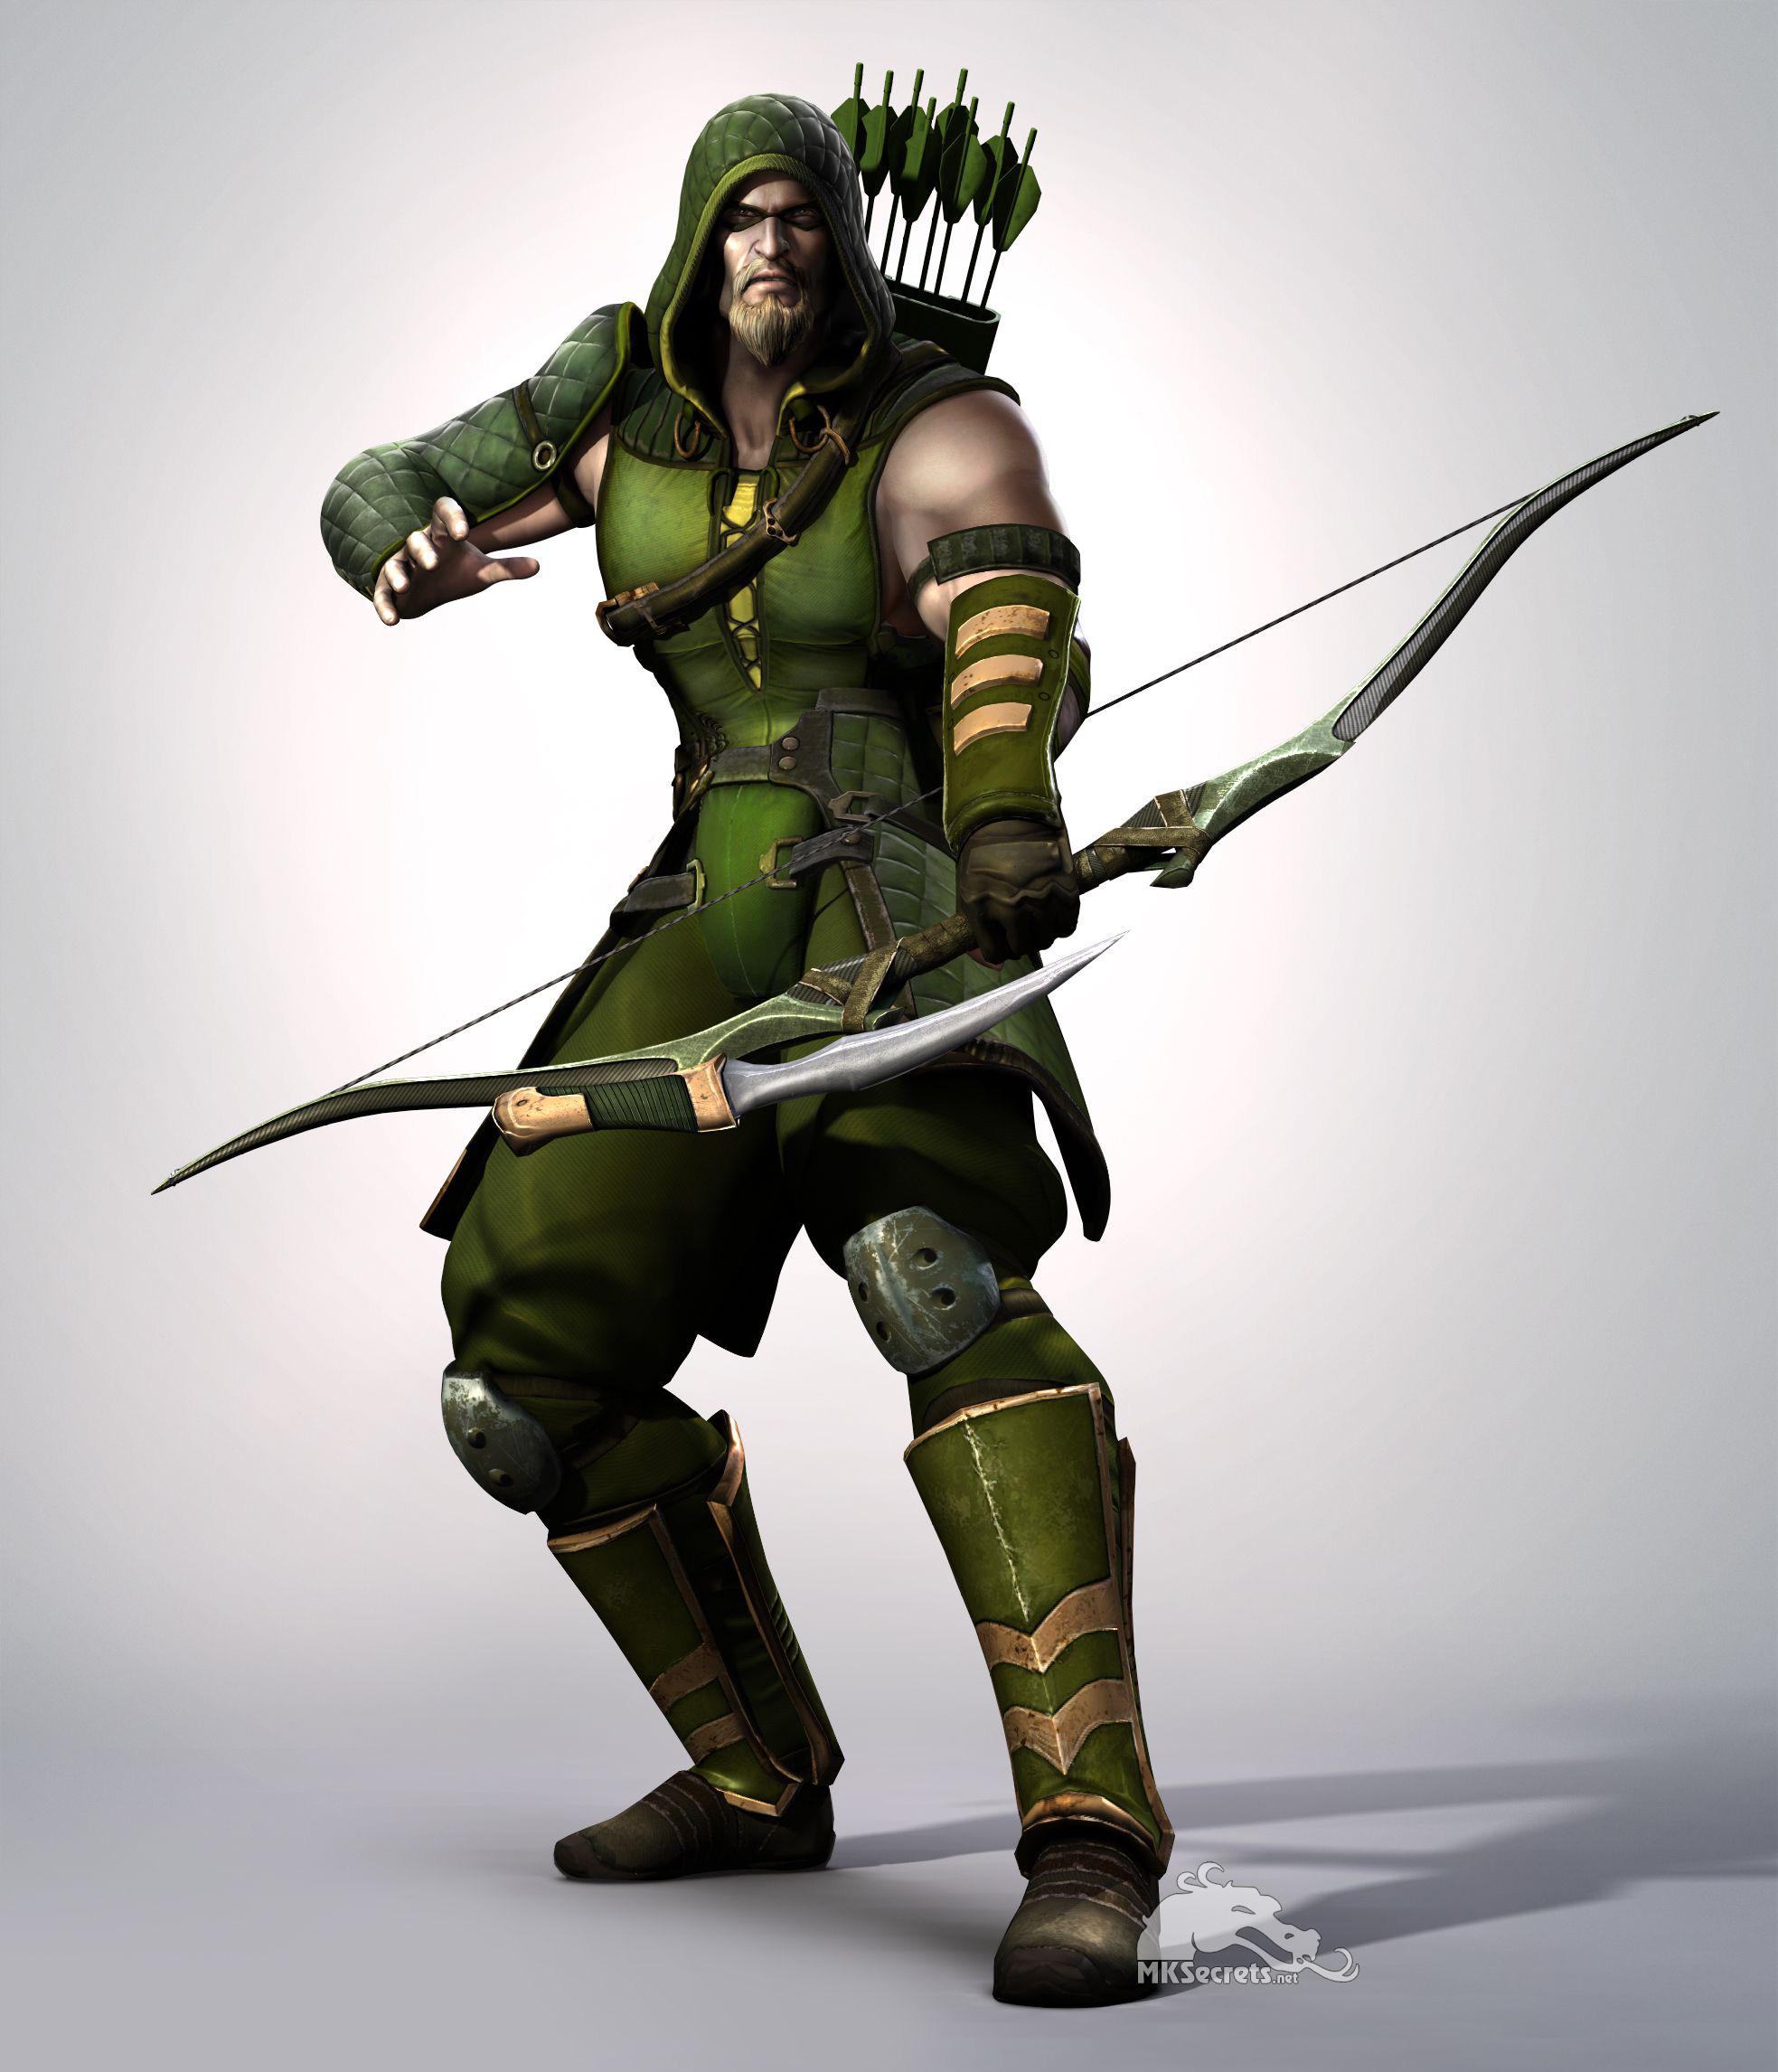 Injustice Gods Among Us Green Arrow Render